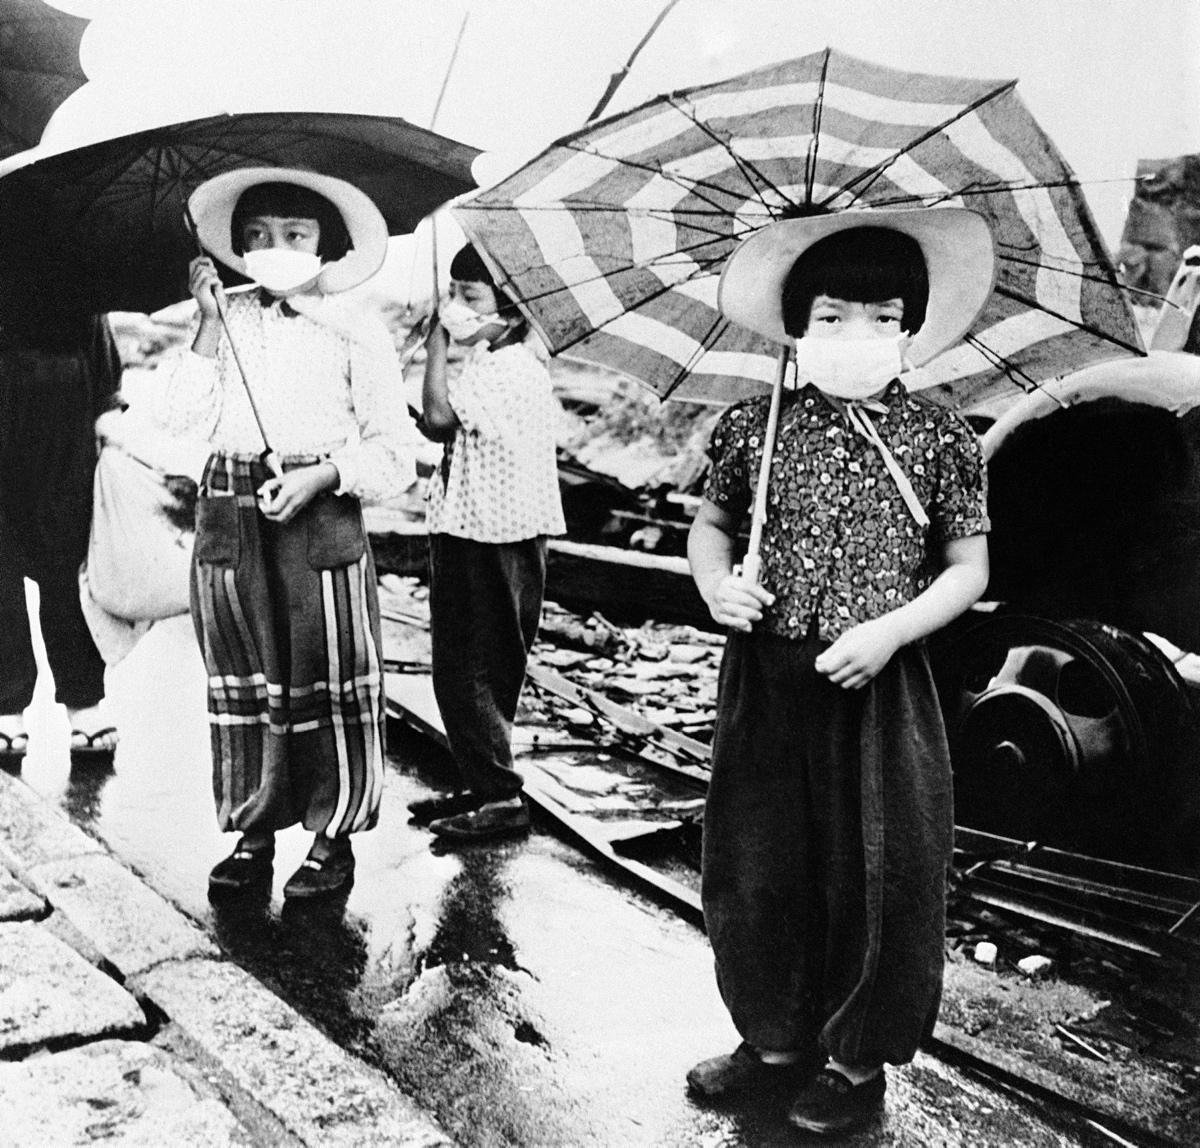 Leia o relato terrível de uma testemunha do bombardeio de Hiroshima 09